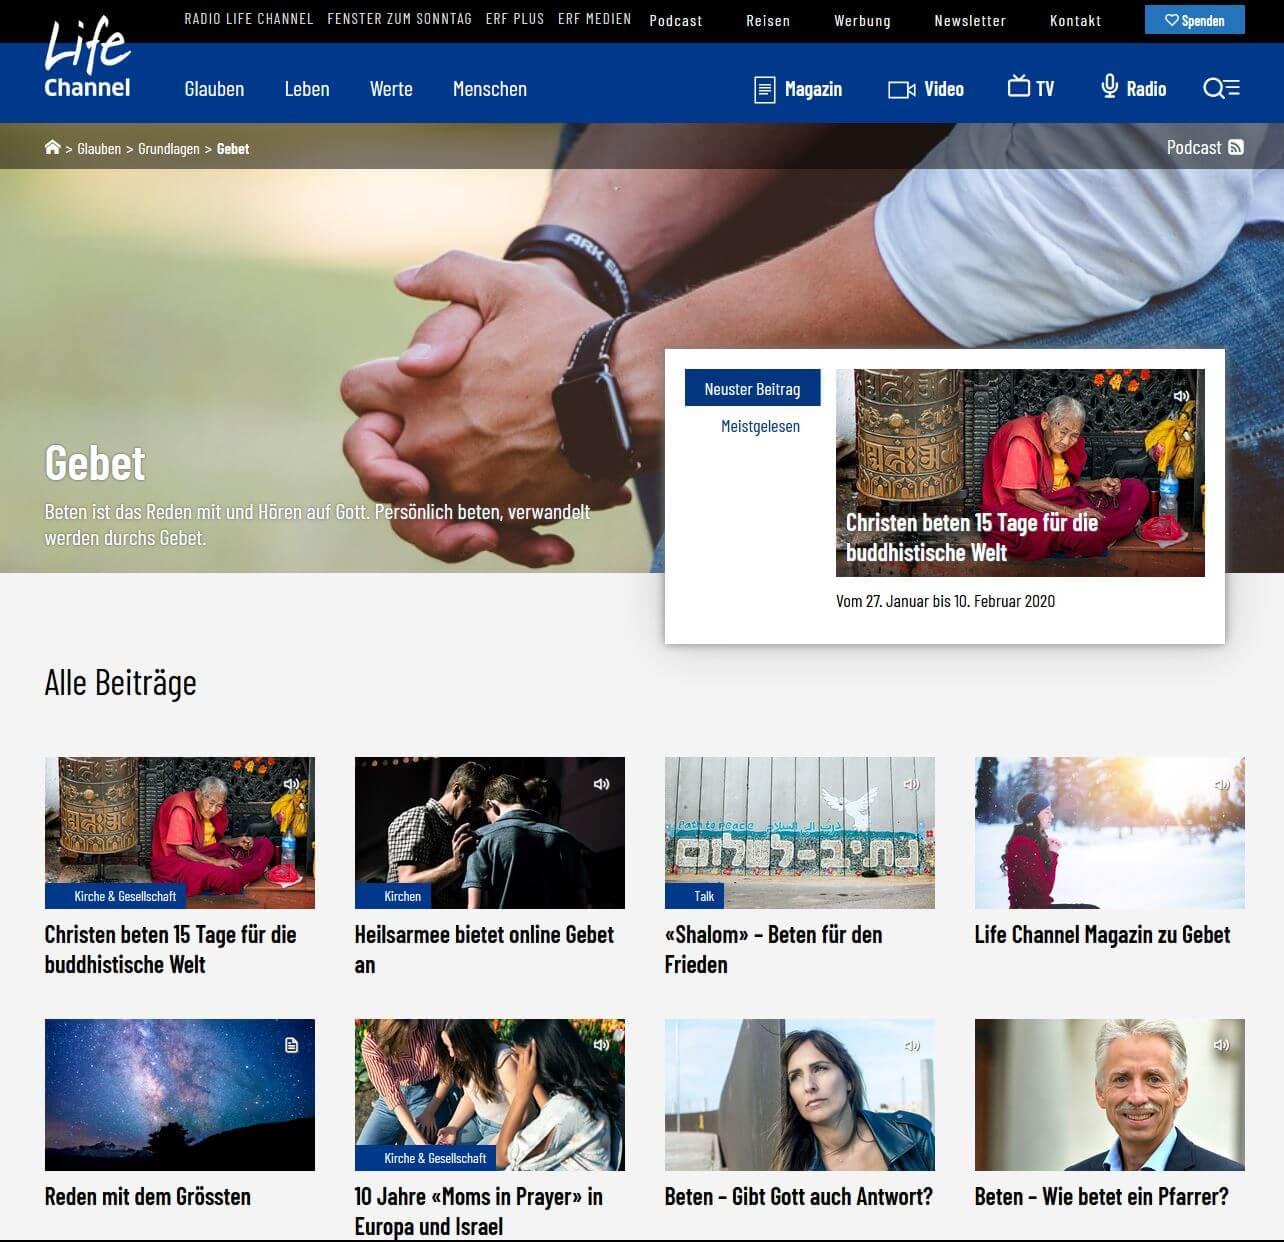 Life Channel.ch: Dossier Beten, Gebet